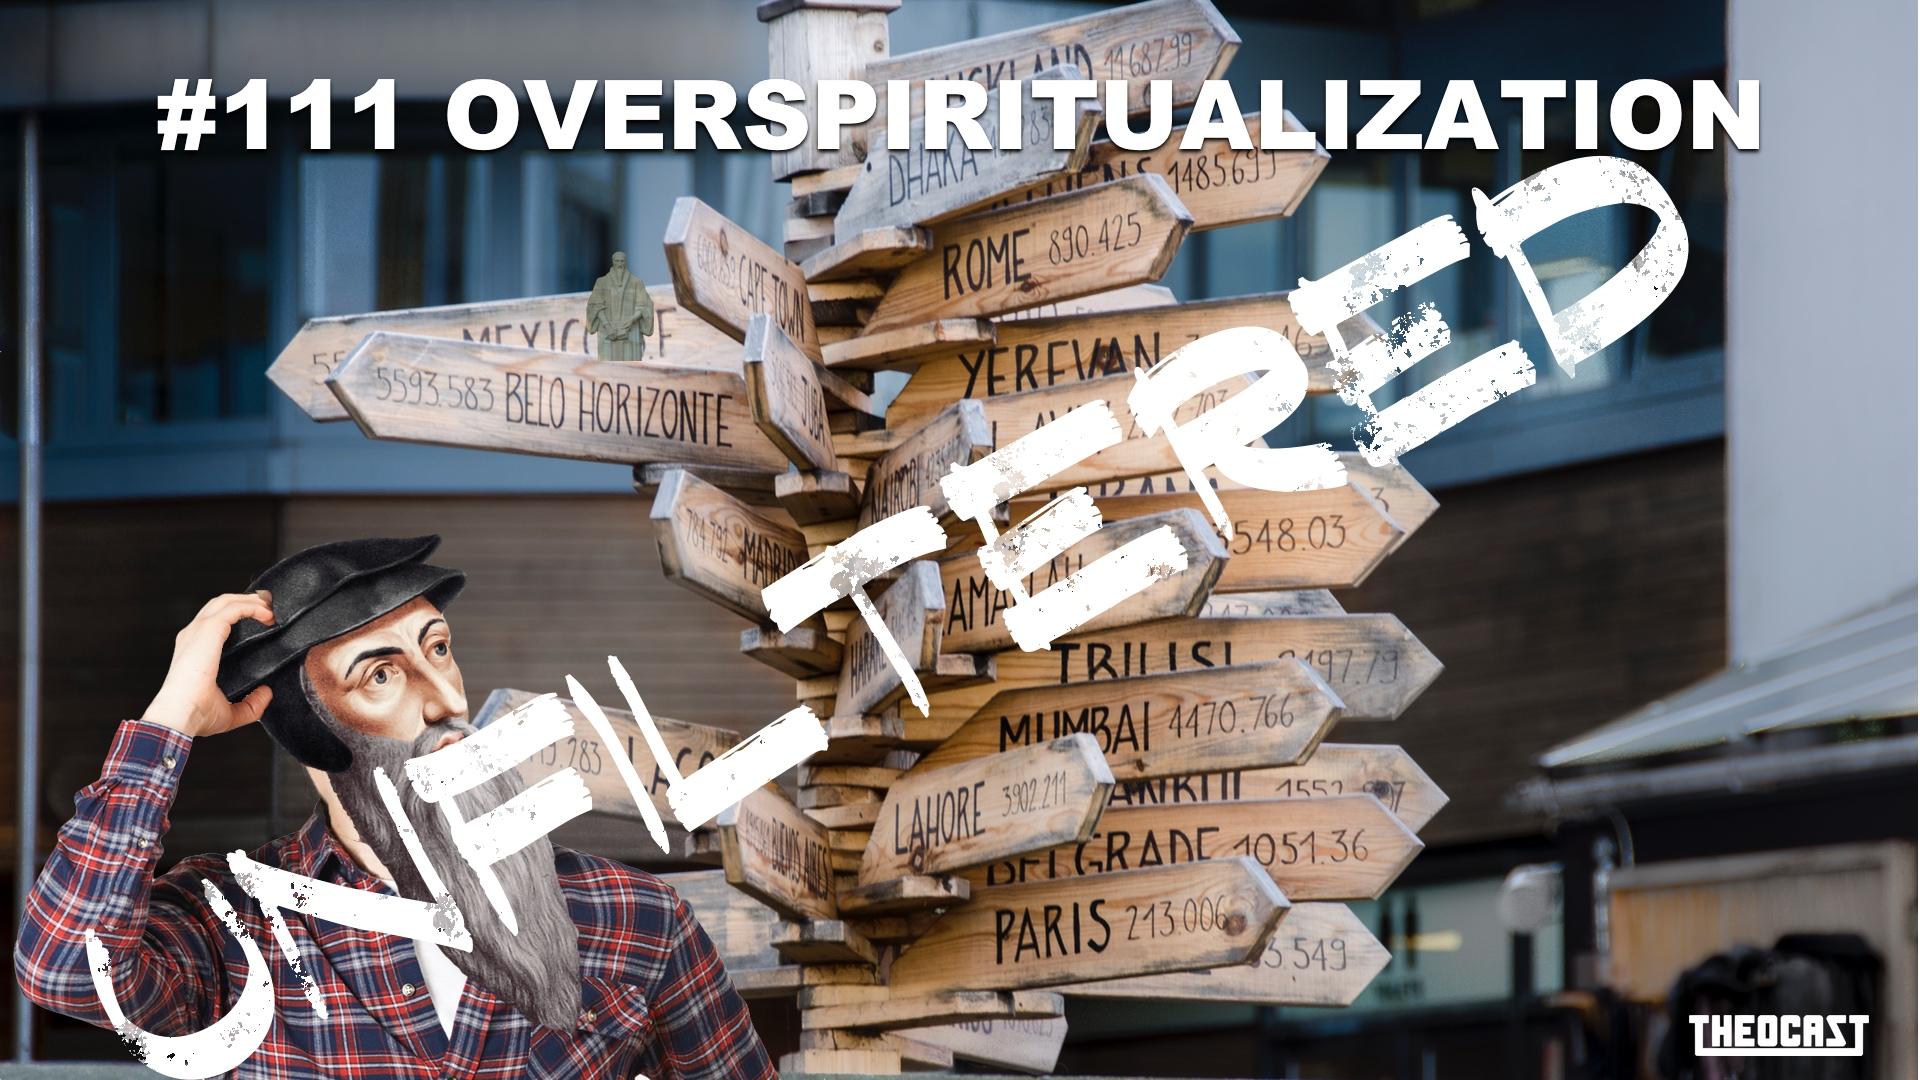 UNFILTERED #111 Overspiritualization